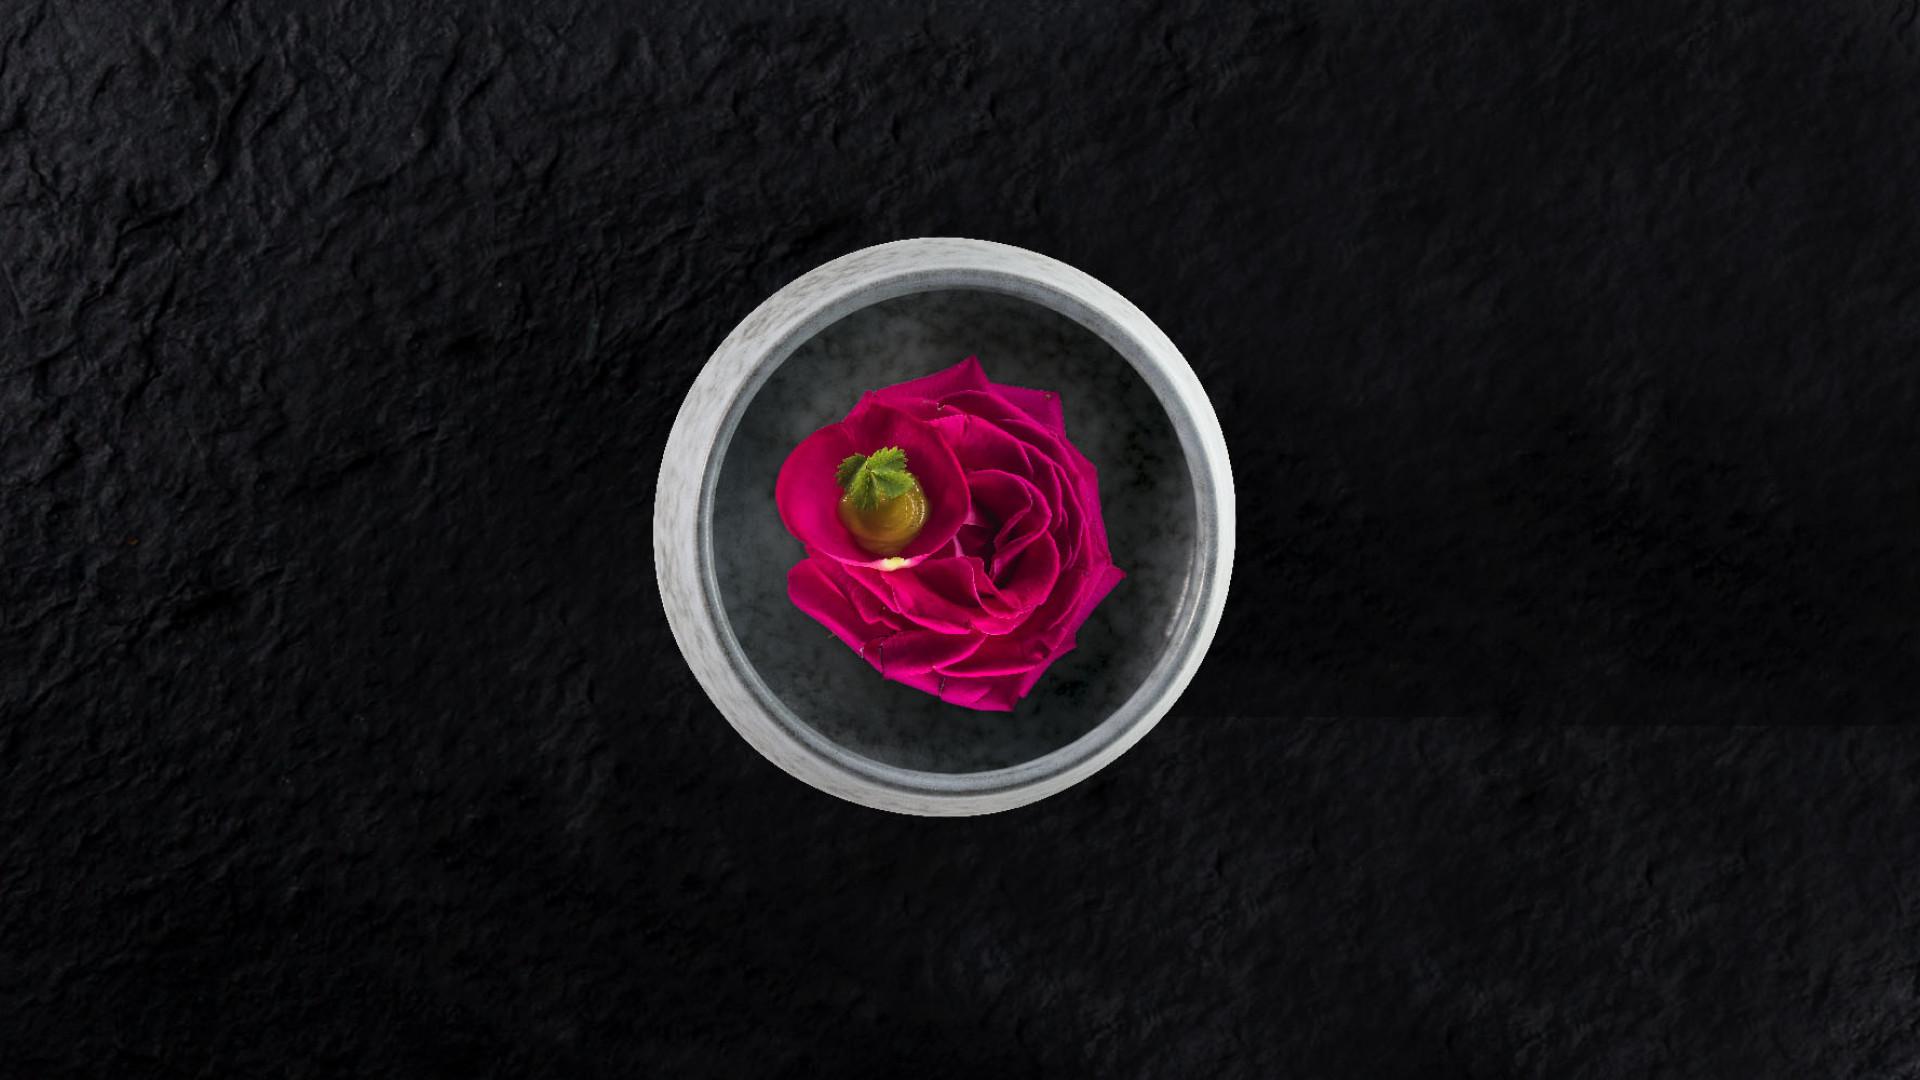 Rose dish from Rigo